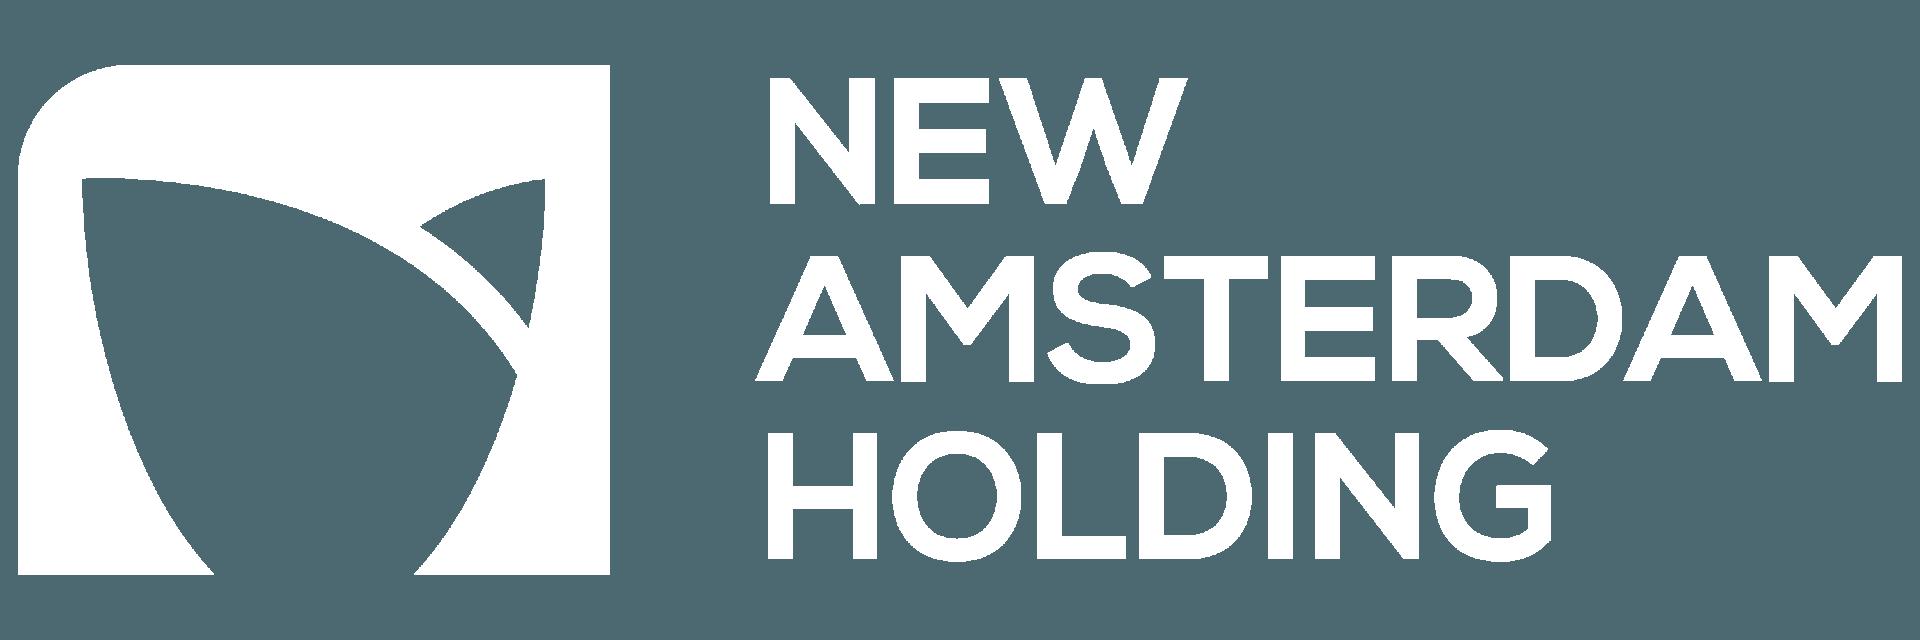 New Amsterdam Holding